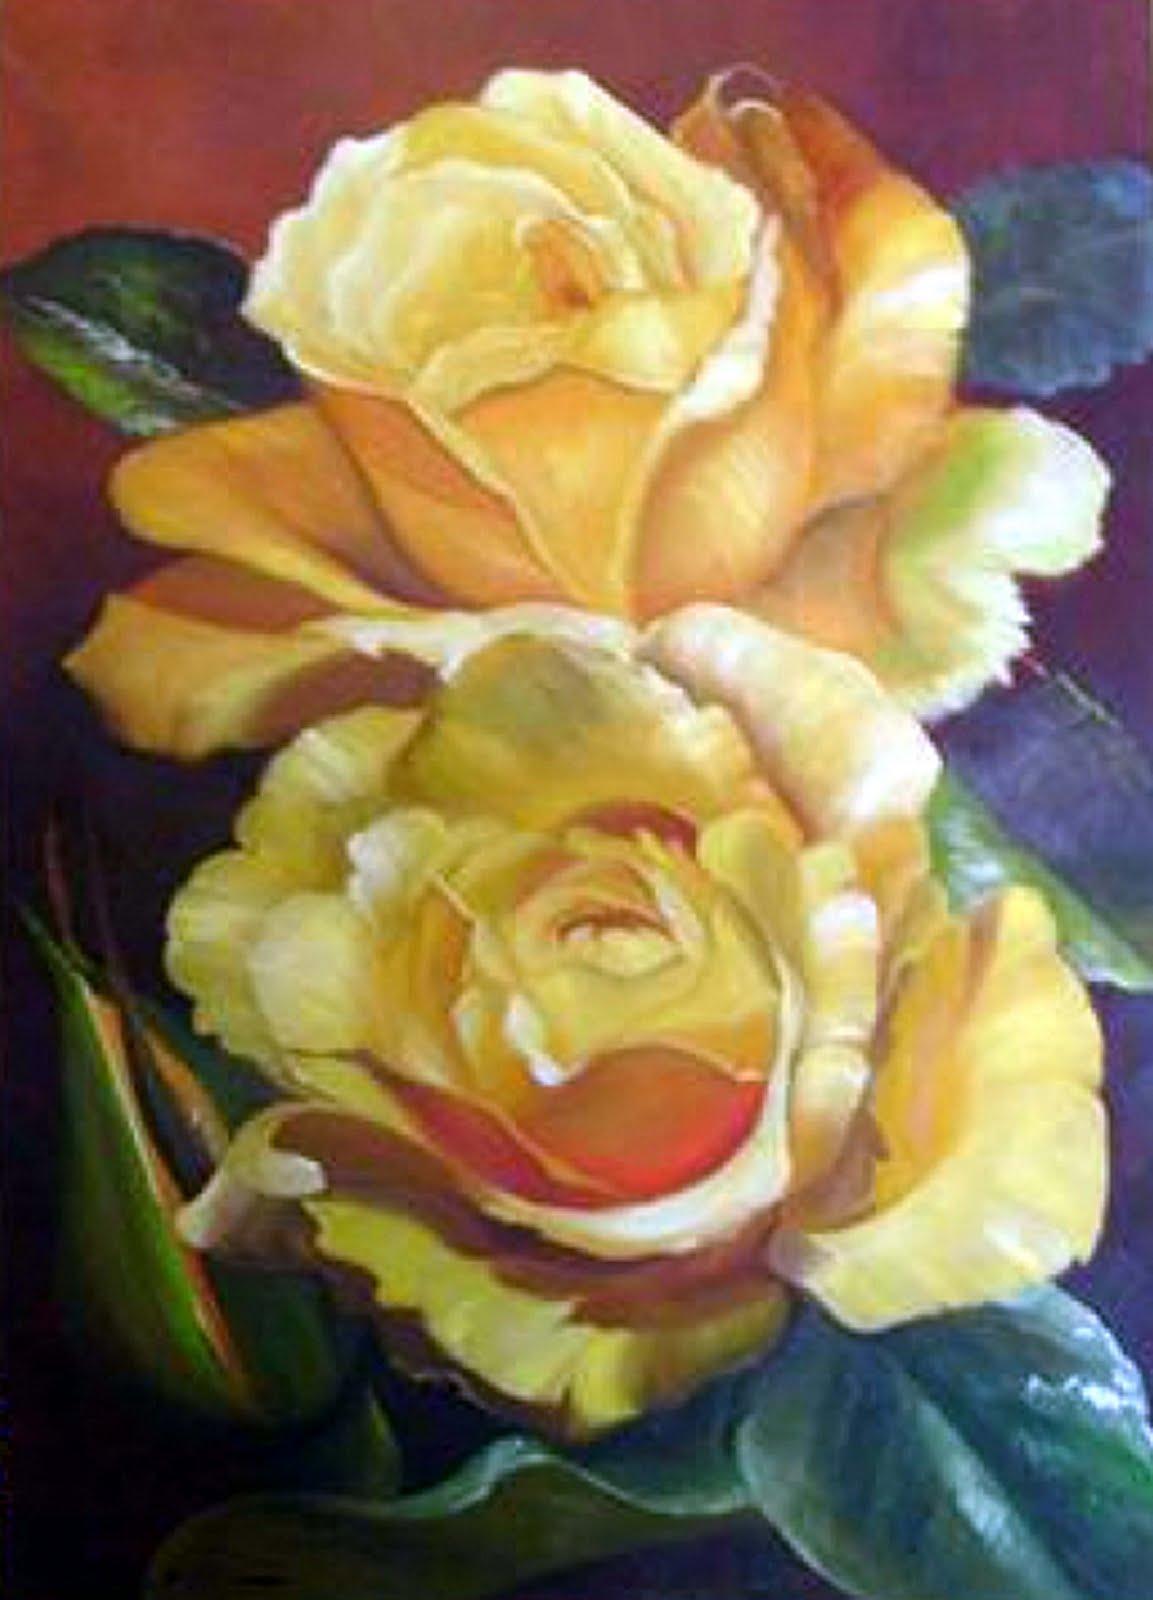 http://3.bp.blogspot.com/-55UMZIhti4M/TcstjWsEK6I/AAAAAAAAEFM/SIymog7CJn4/s1600/Floral_DAVI1.jpg